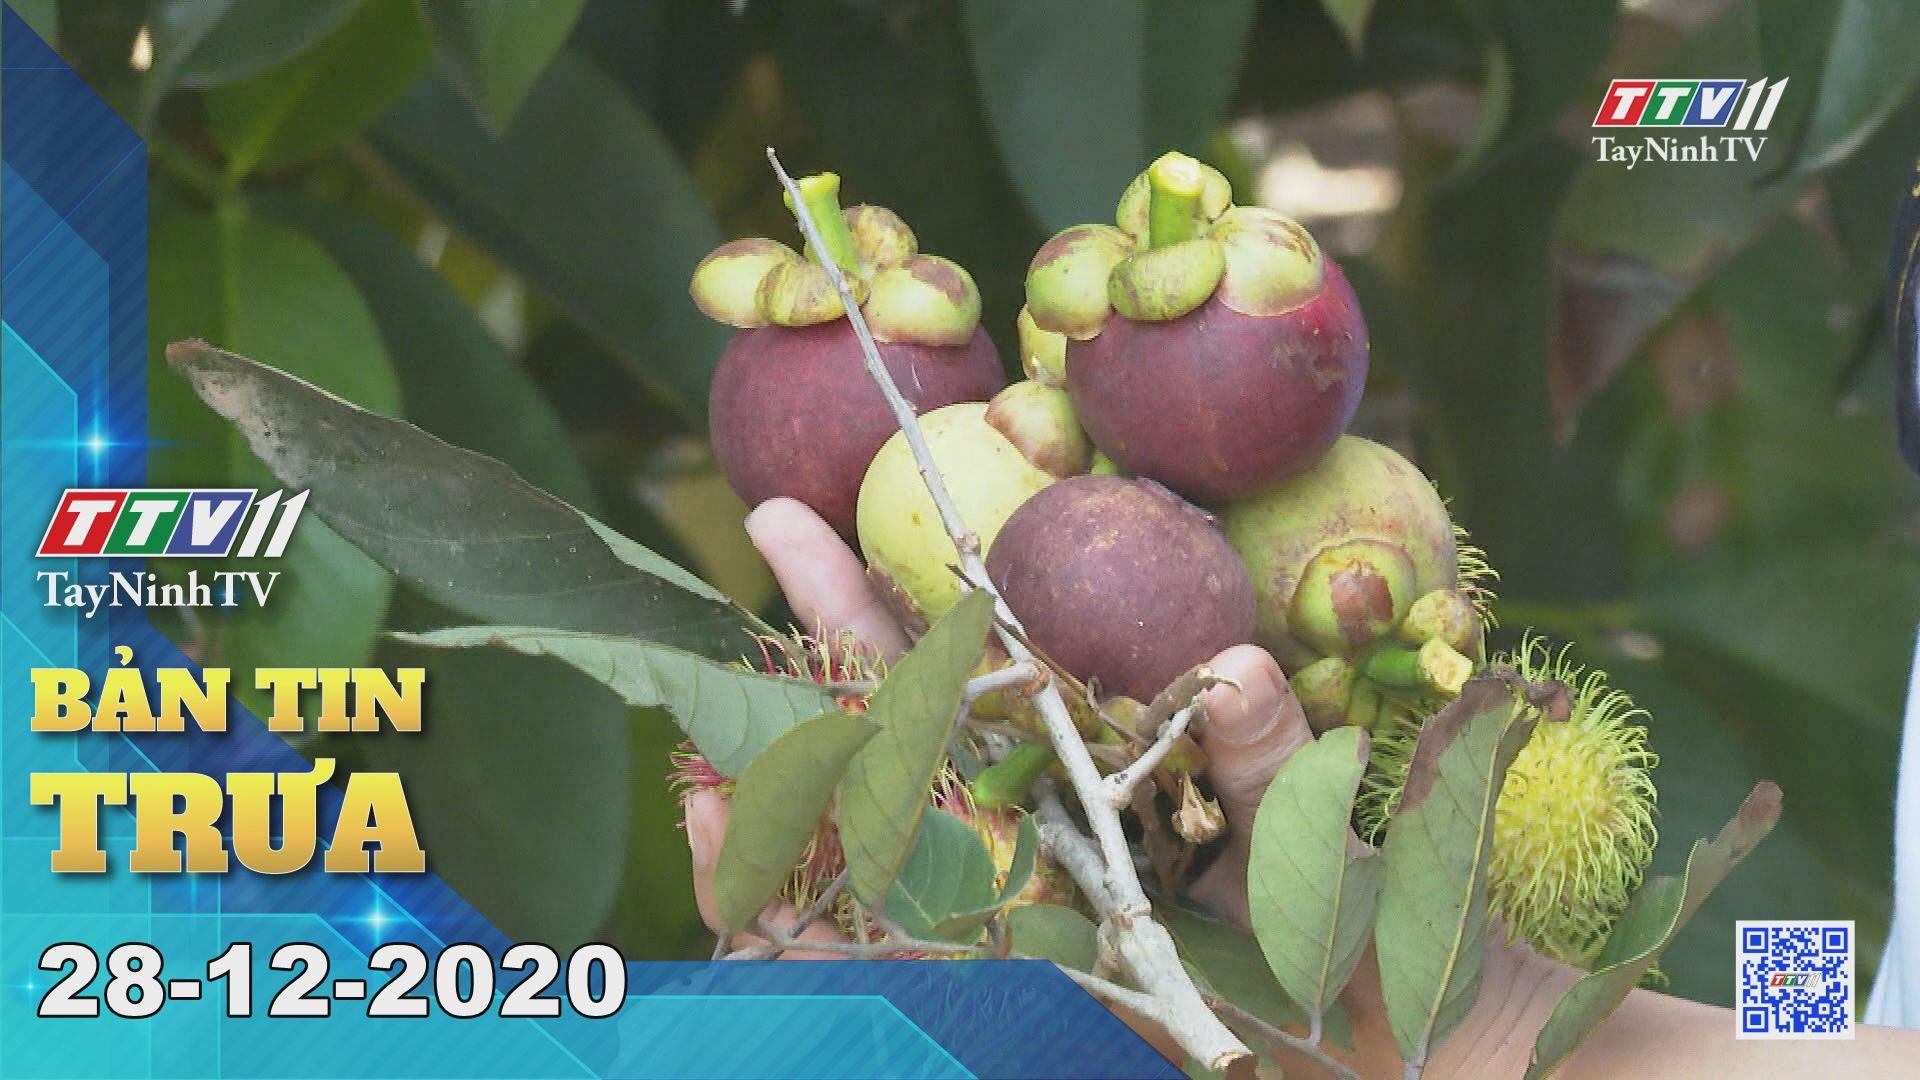 Bản tin trưa 28-12-2020 | Tin tức hôm nay | TayNinhTV